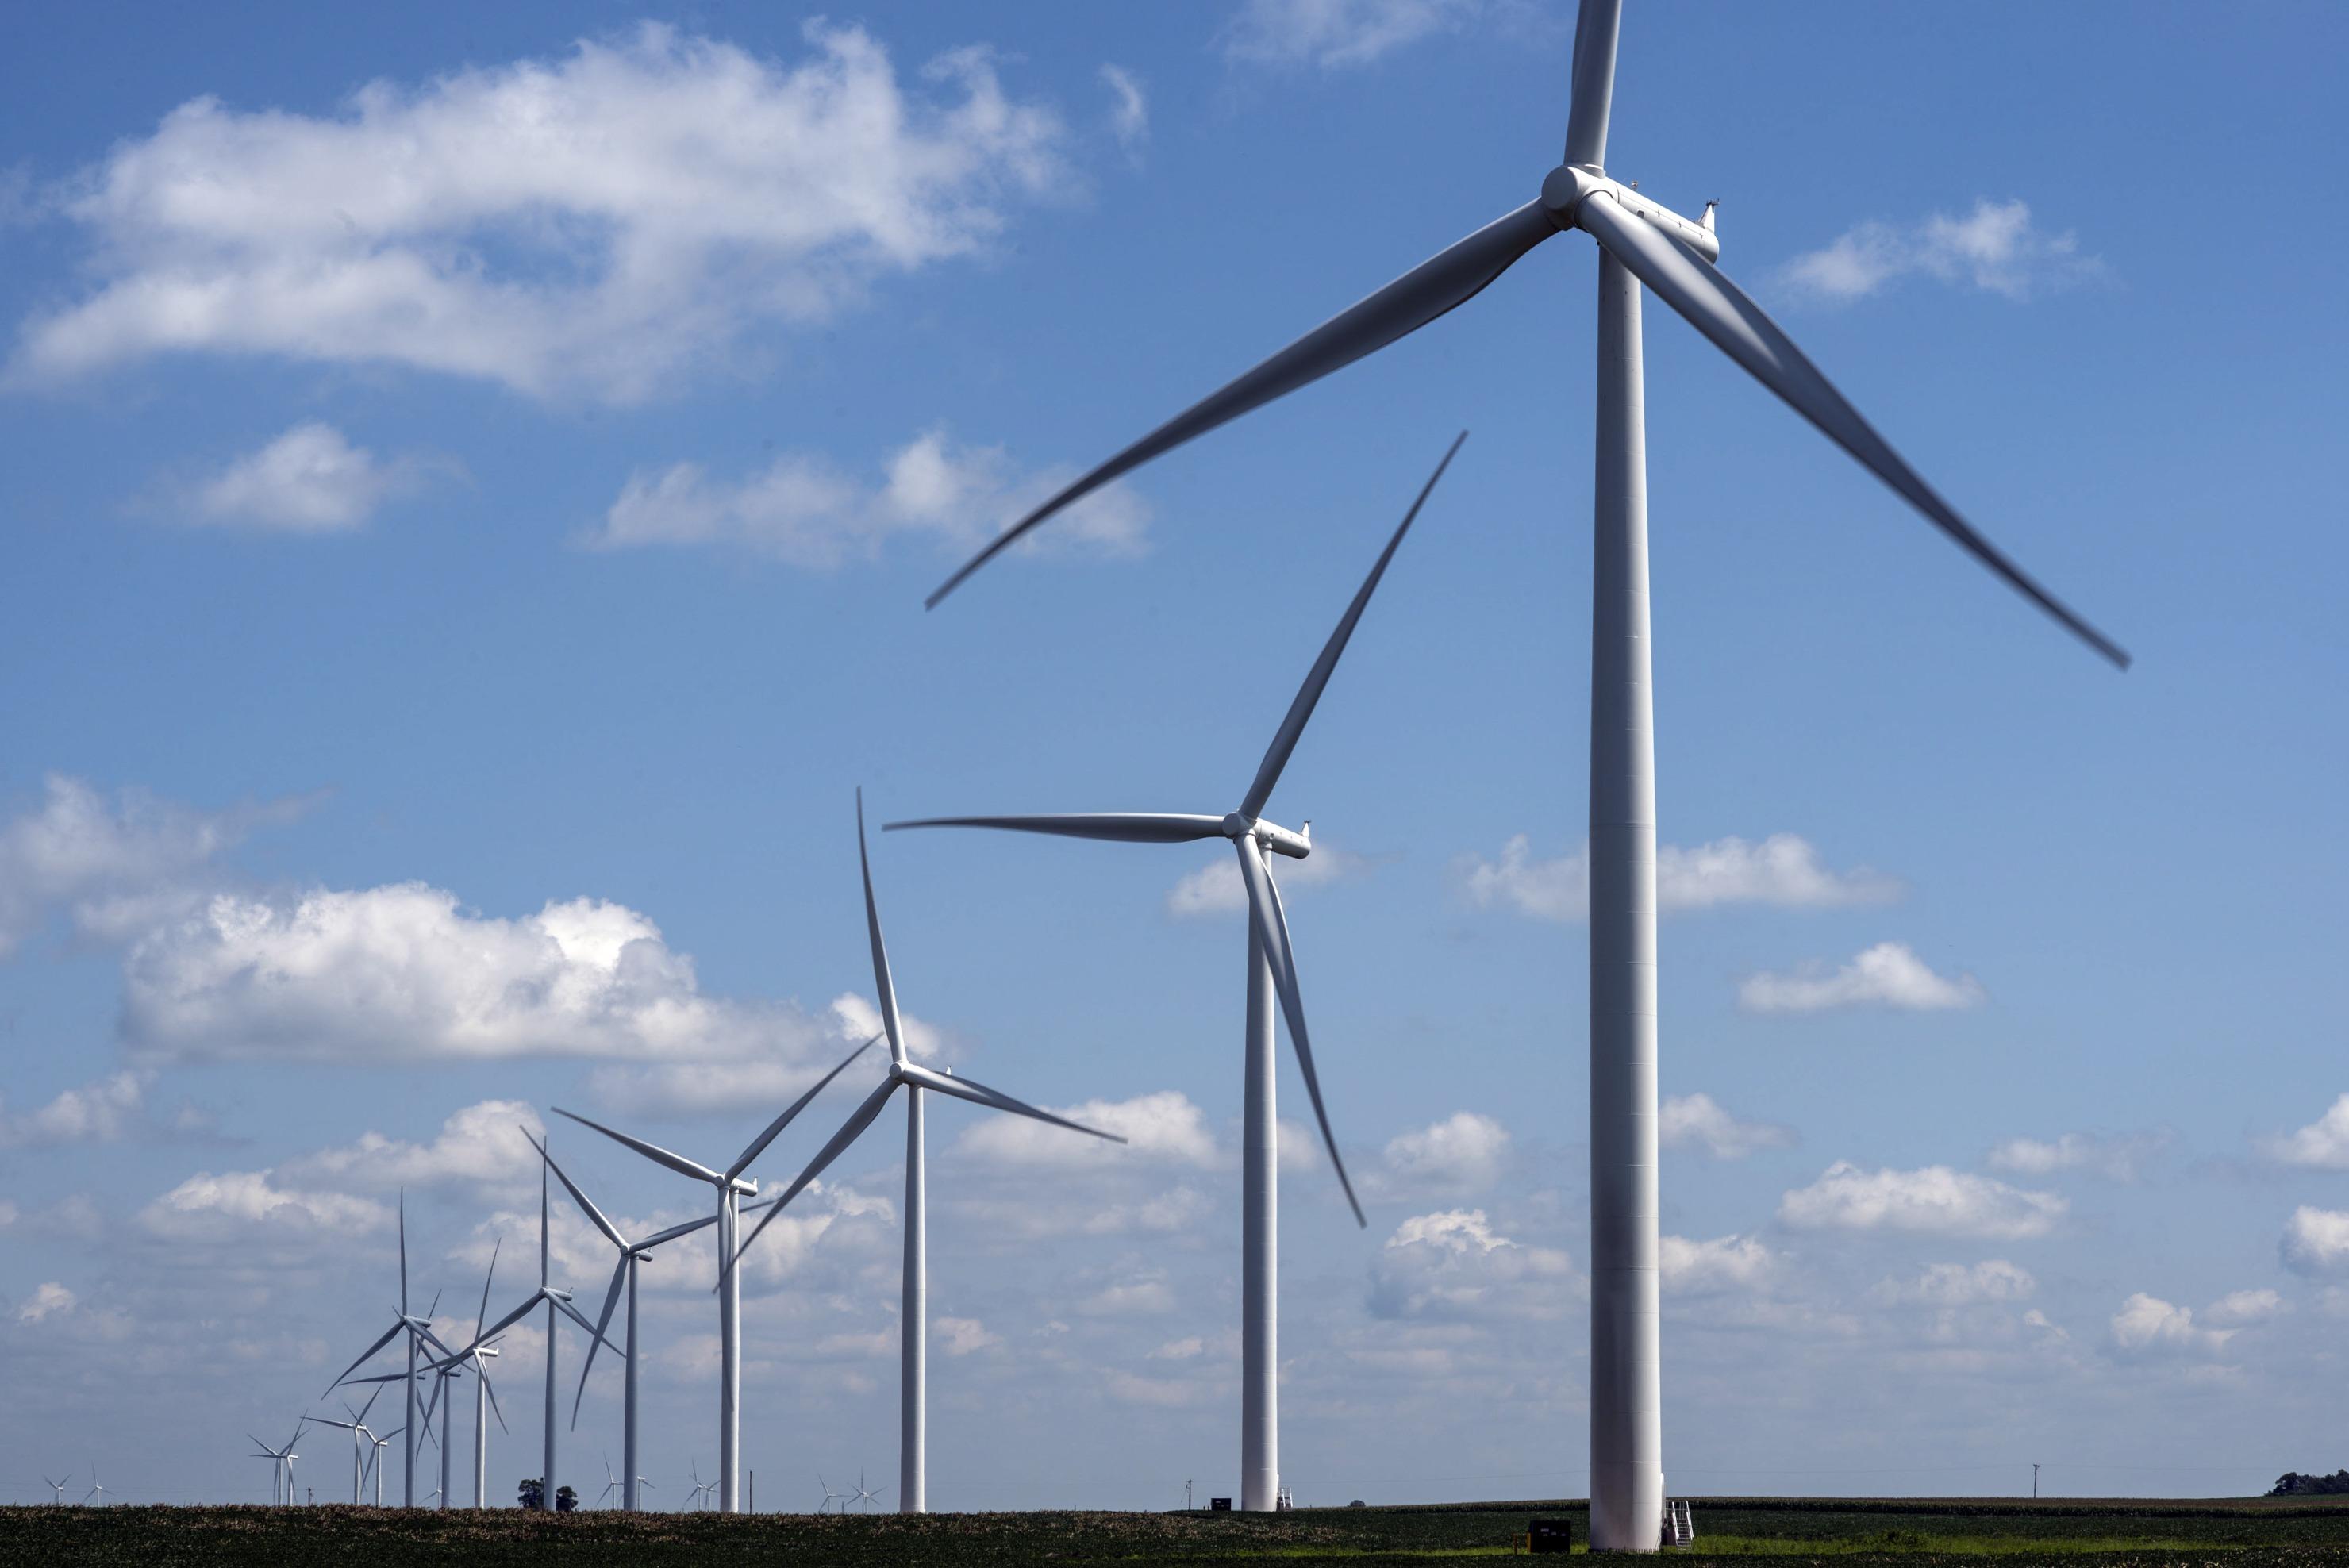 Siemens Gamesa Gets 200 Megawatt Order for Indian Wind Park